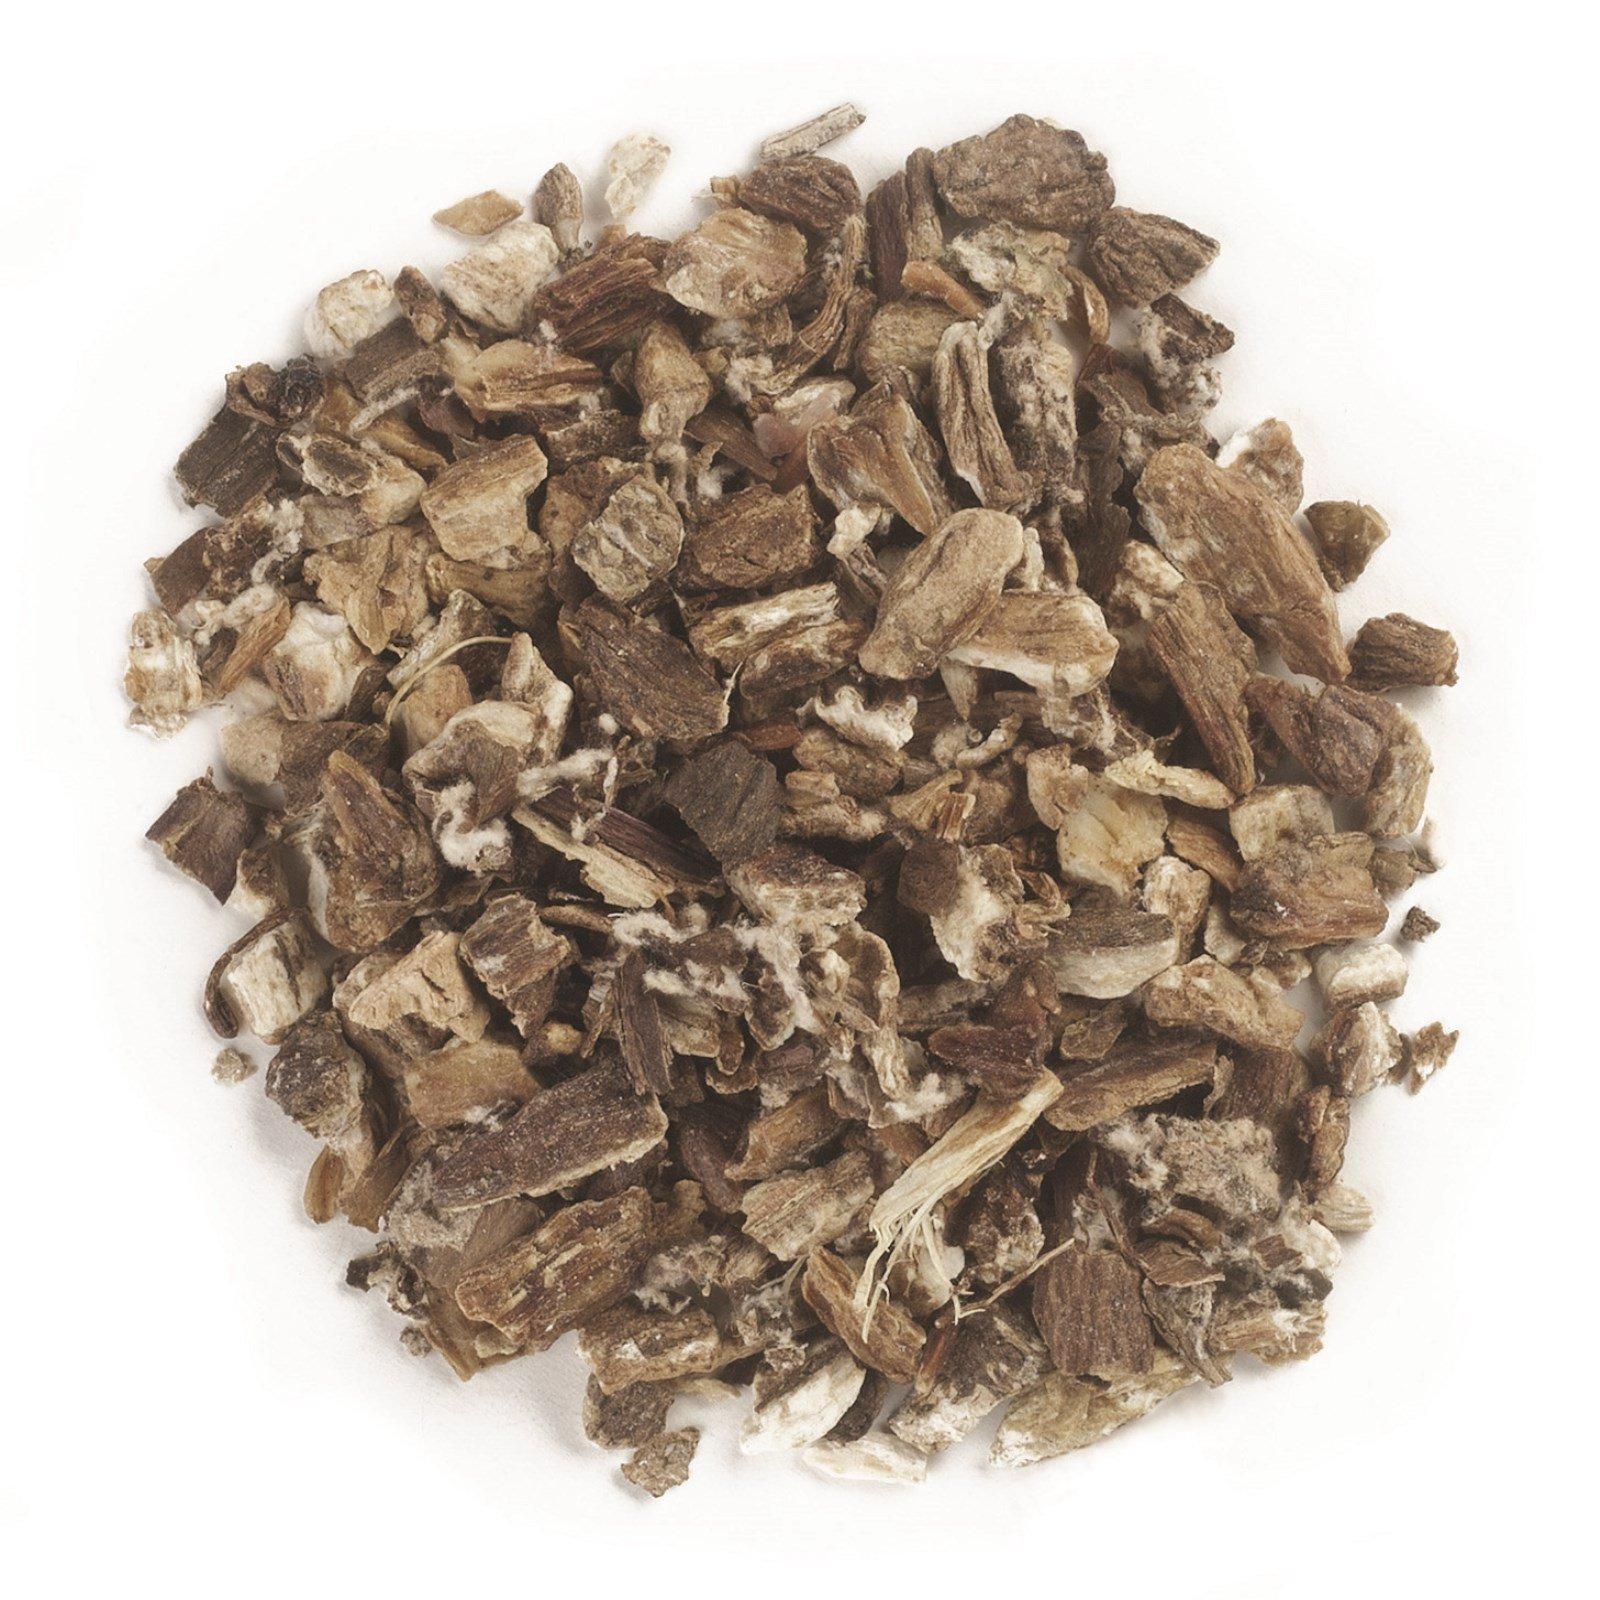 Frontier Natural Products, Молотый корень лопуха, 16 унций (453 г)